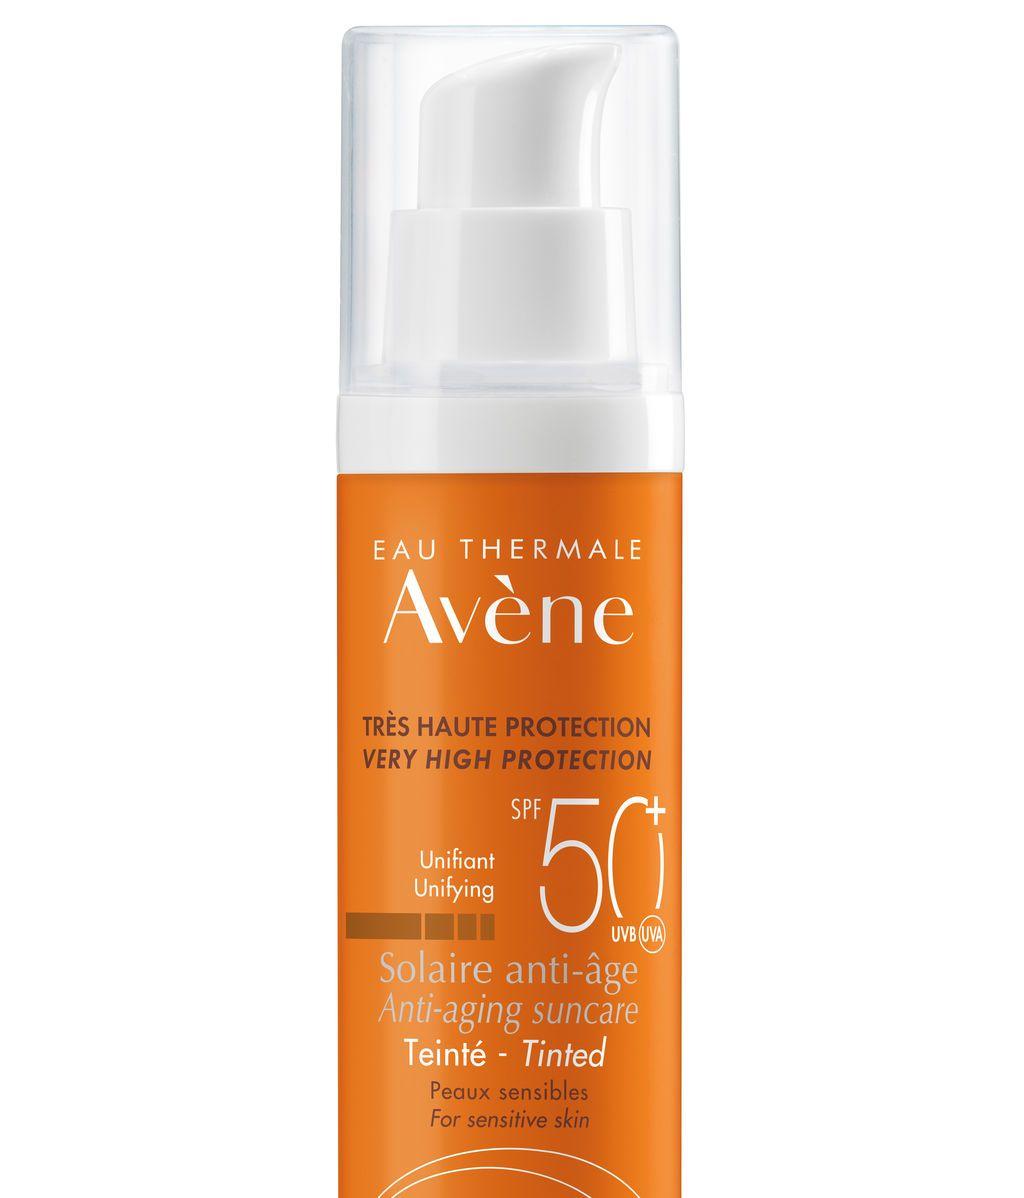 AVENE SOLAIRE-50ml-ANTI-AGE-TEINTE-50+